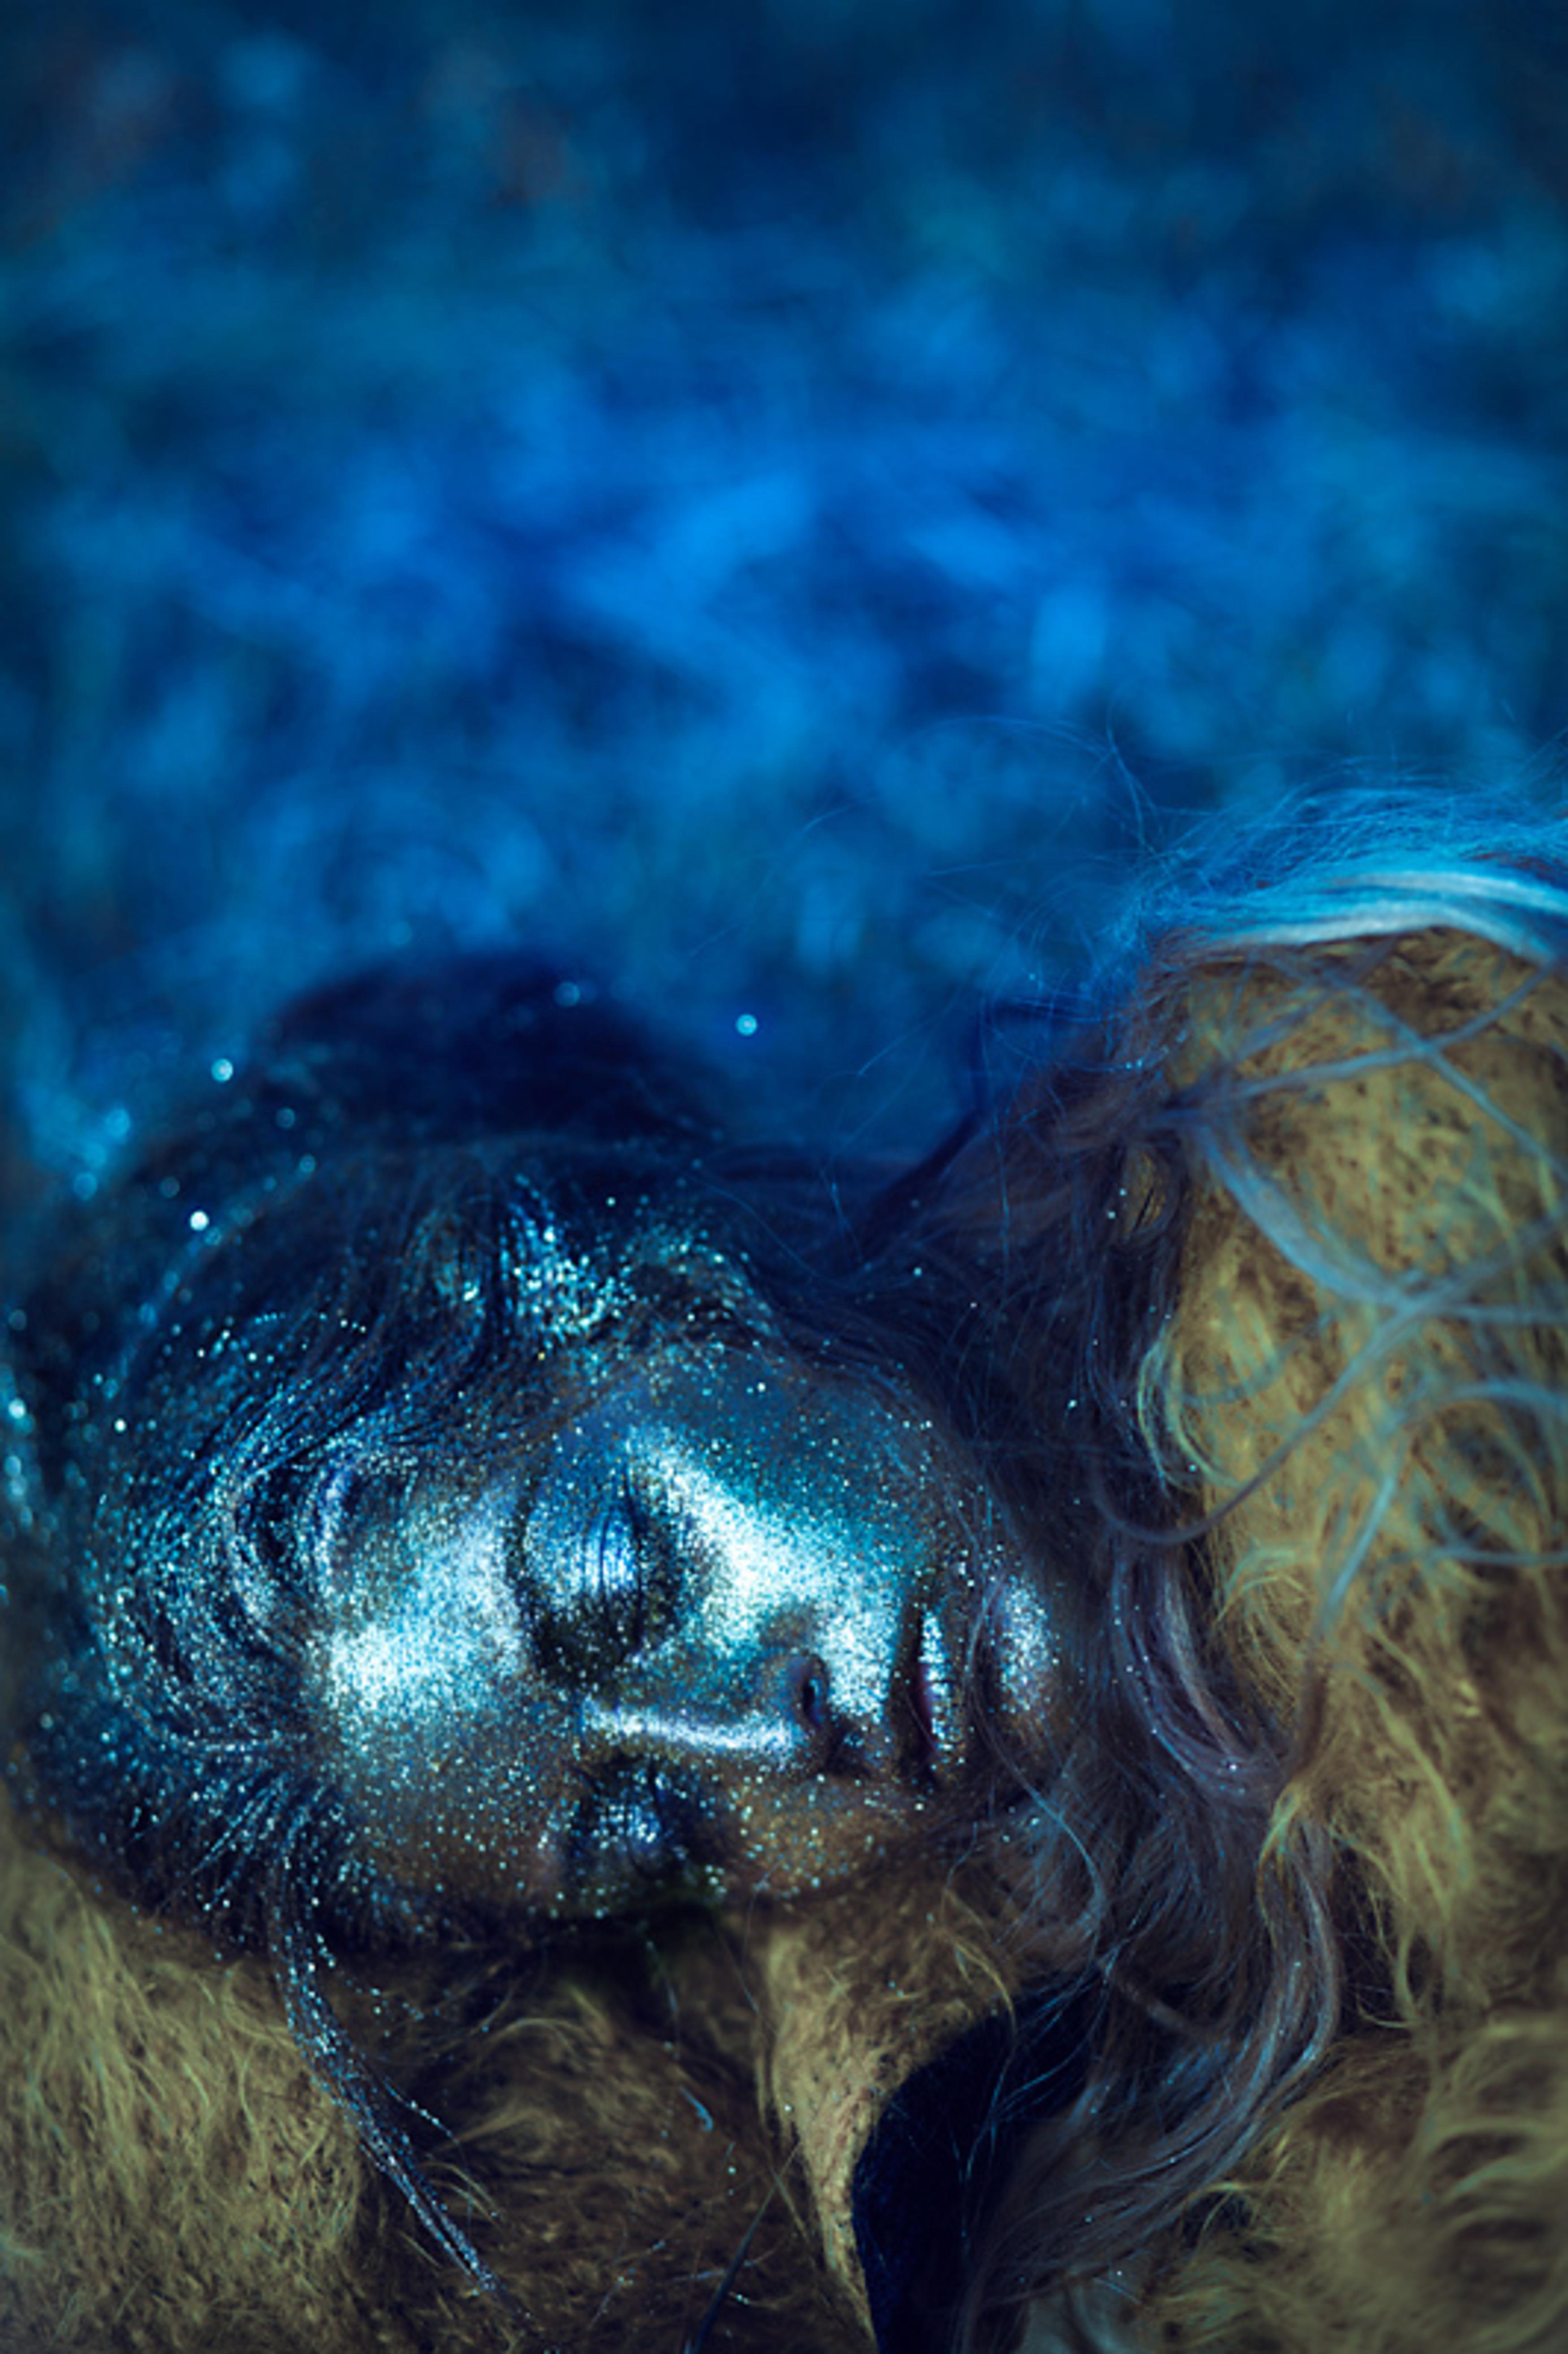 Kísérteties hallucinációk